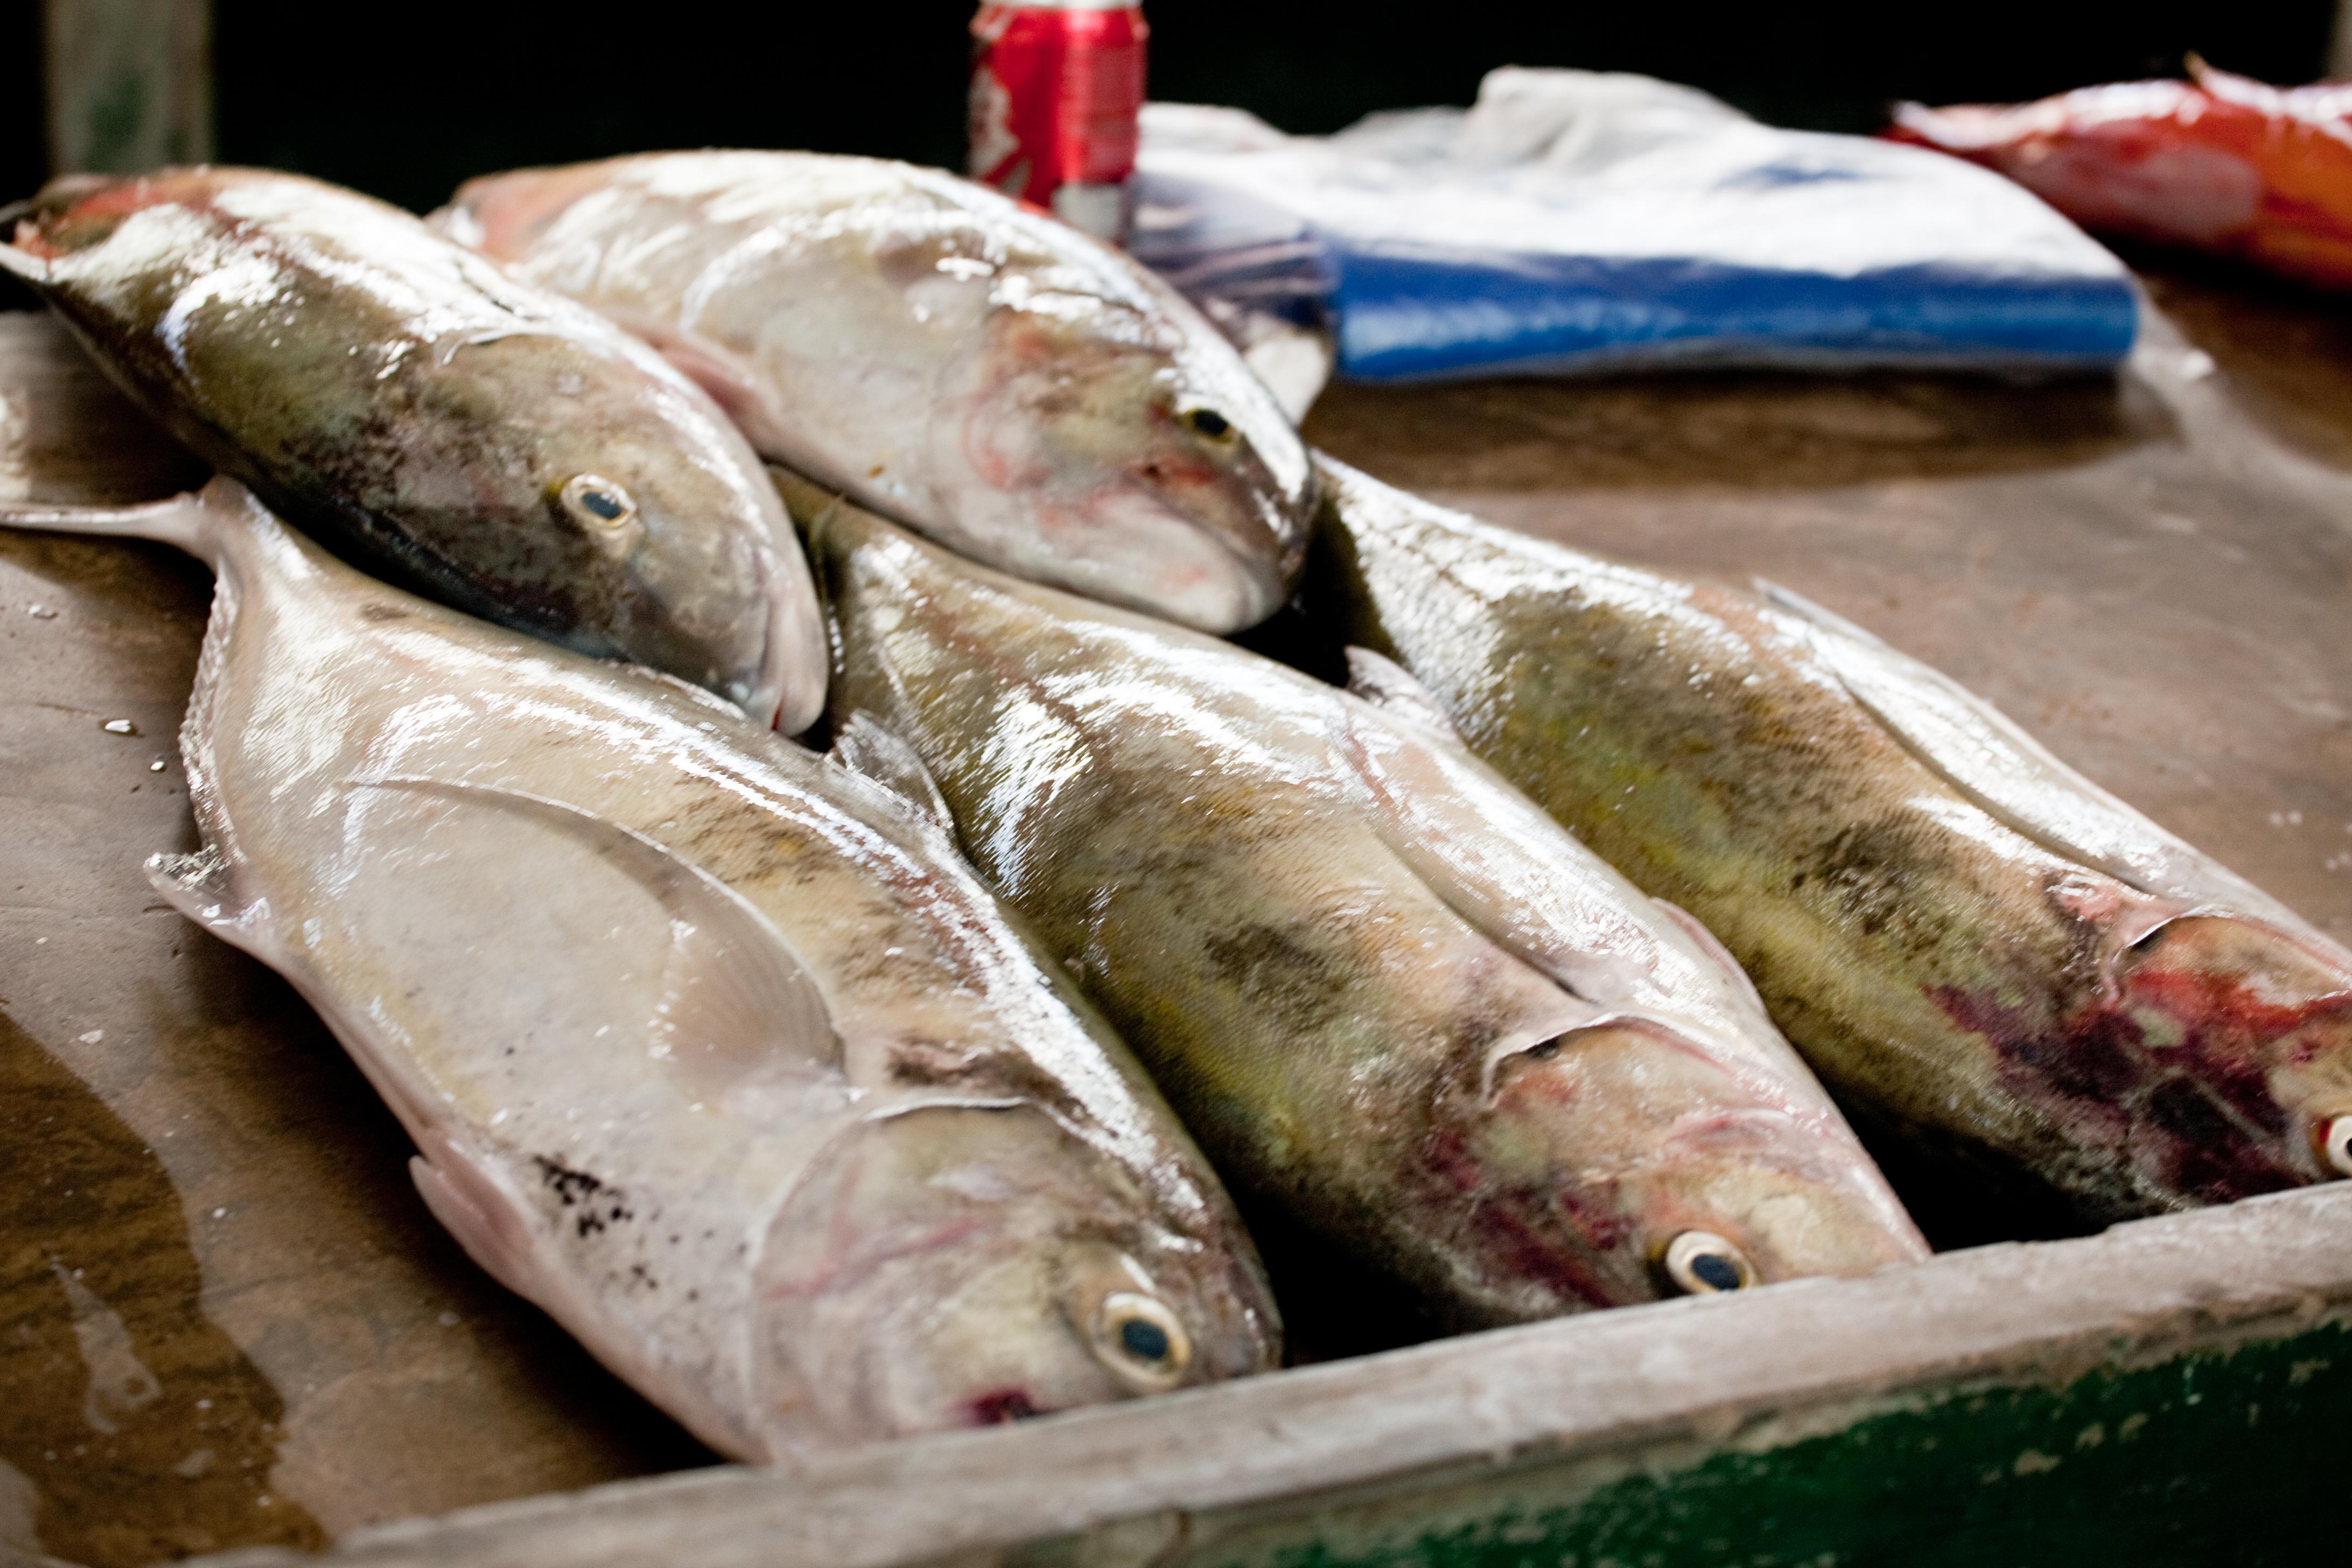 Fish market grid arendal for Lawrence fish market menu